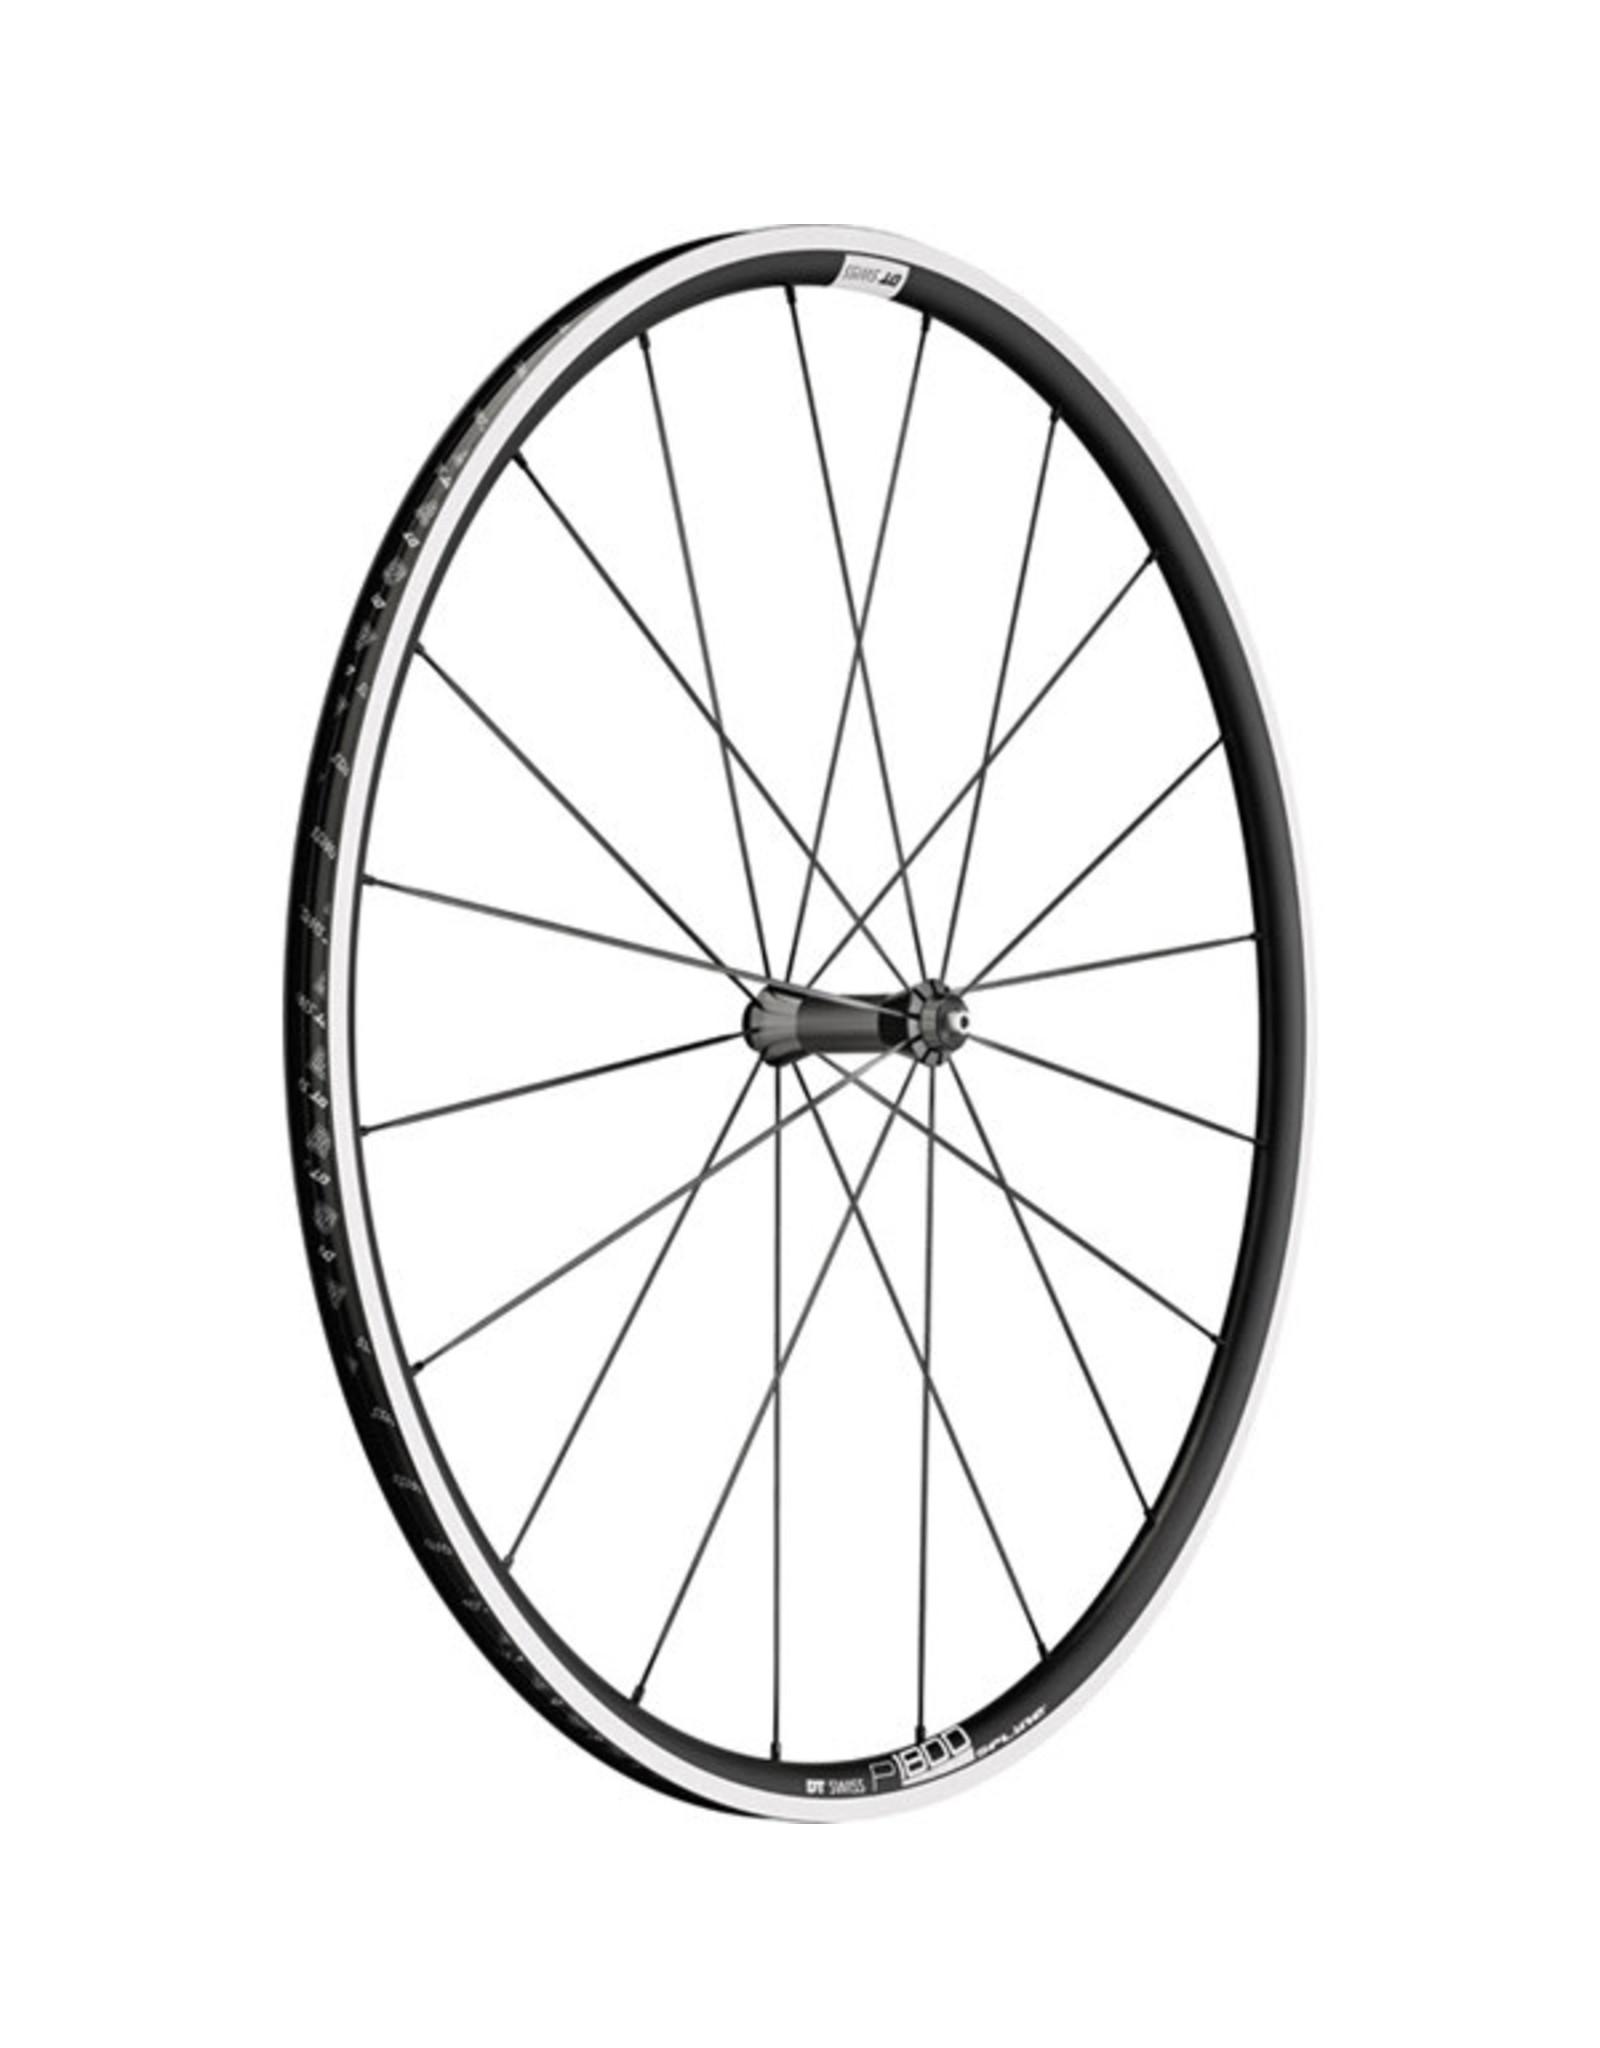 DT Swiss Wheel P 1800